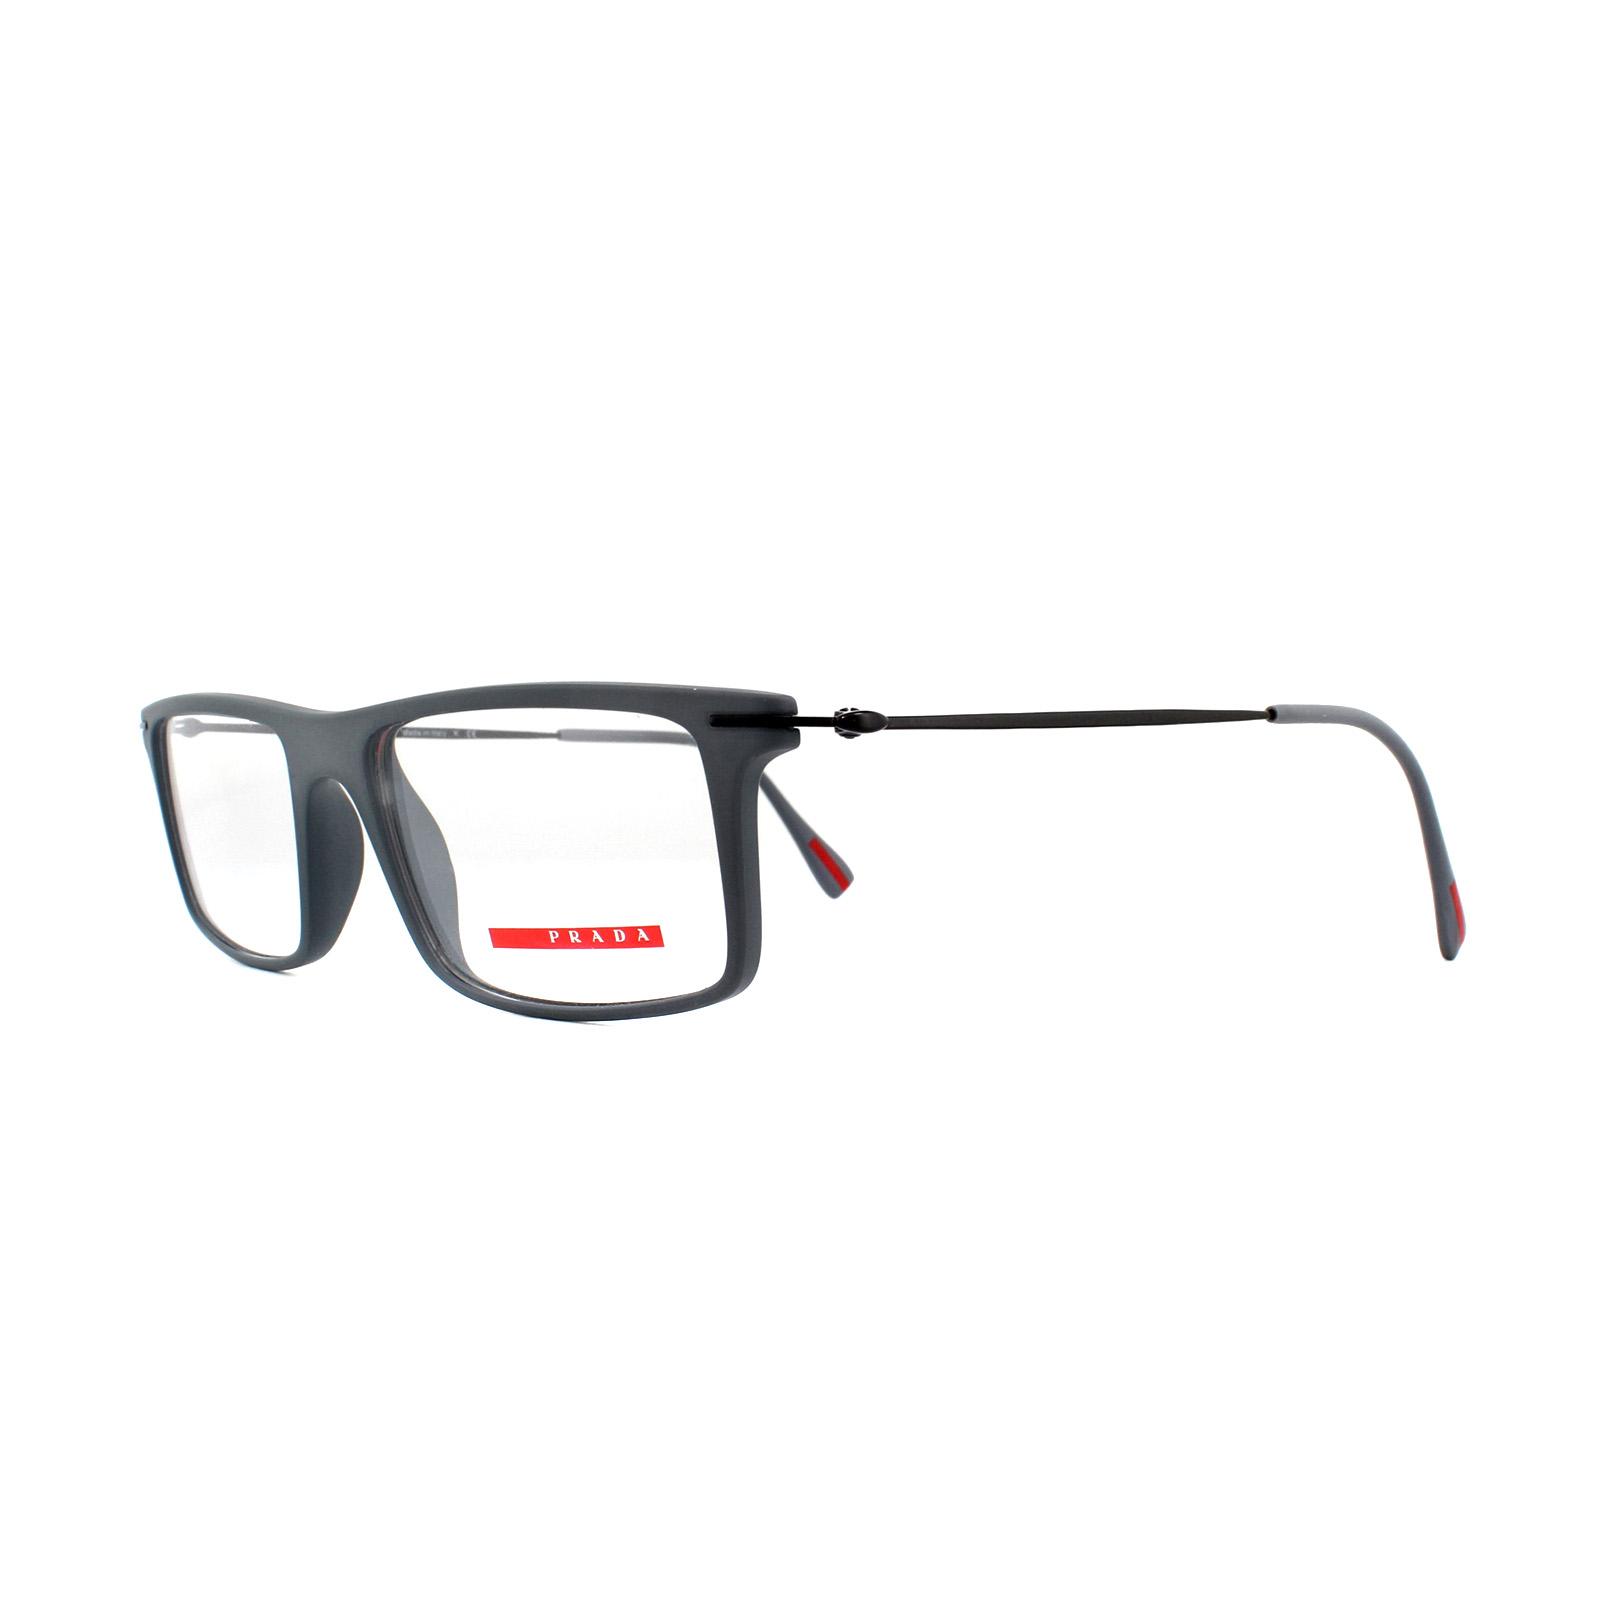 15f8215a8d4 Sentinel Prada Sport Glasses Frames PS 03EV ROR1O1 Grey 51mm Mens